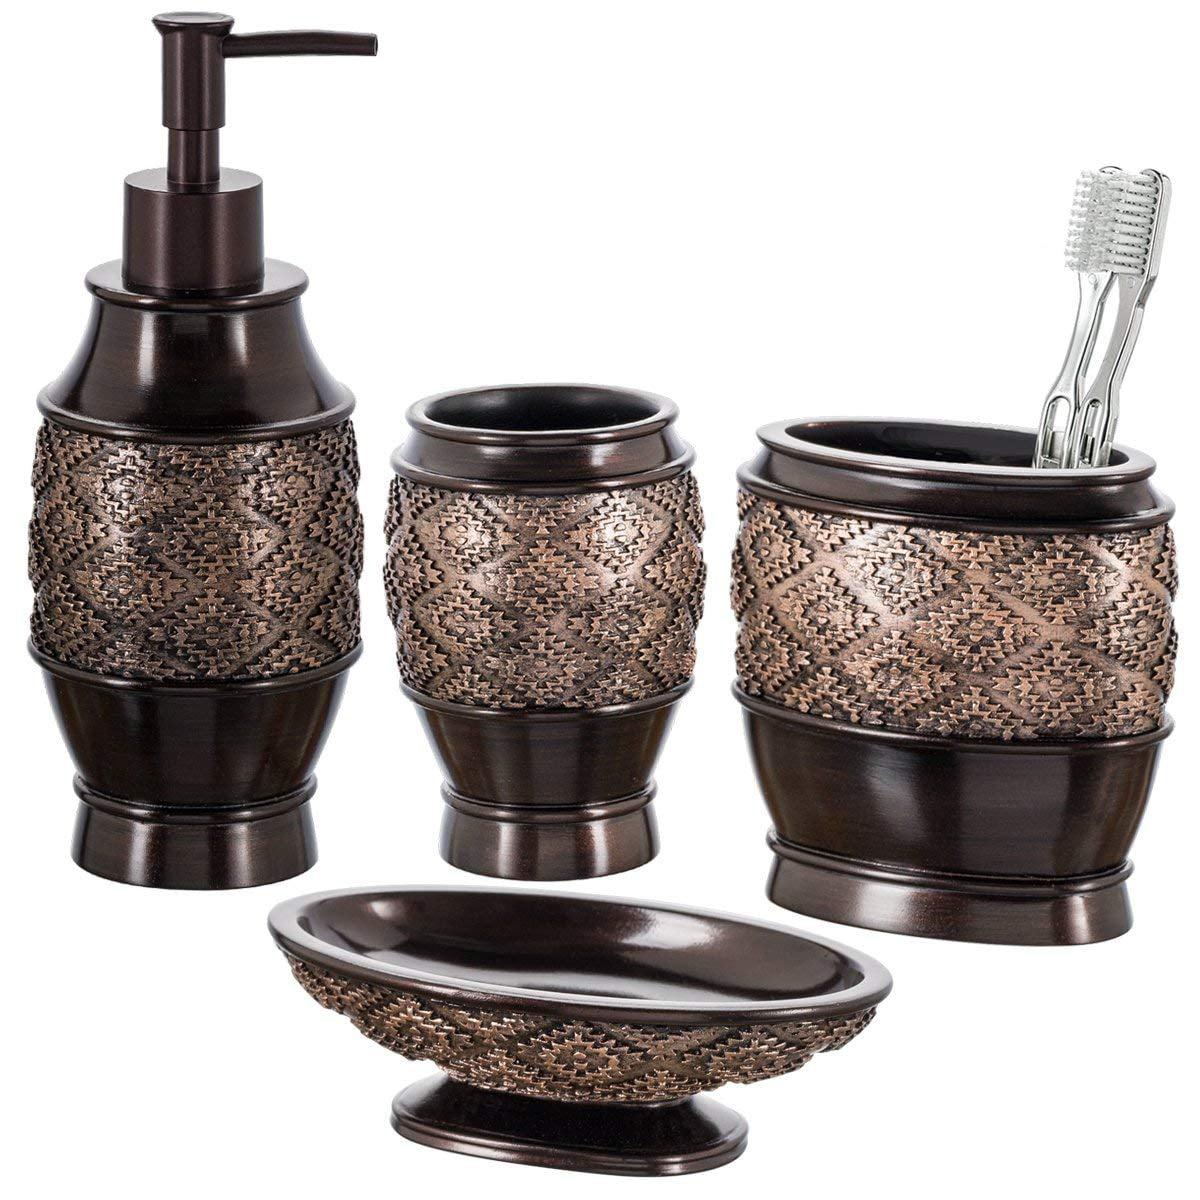 Toothbrush Holder /& Tumbler Set Soap Dispenser Dark Brown Ceramic Soap Dish